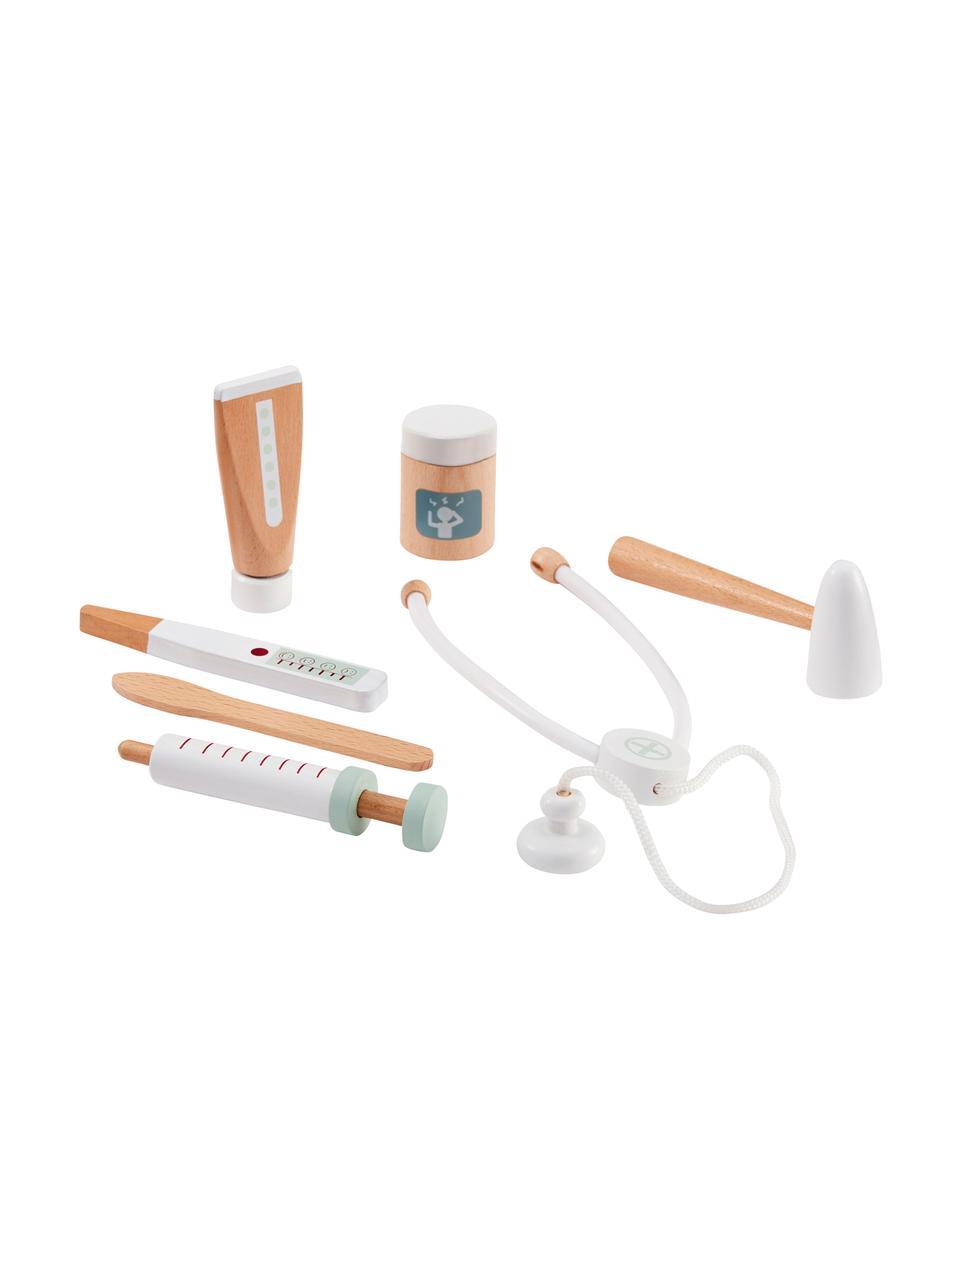 Spielzeug-Set Doctor, Weiß, Mehrfarbig, 20 x 8 cm